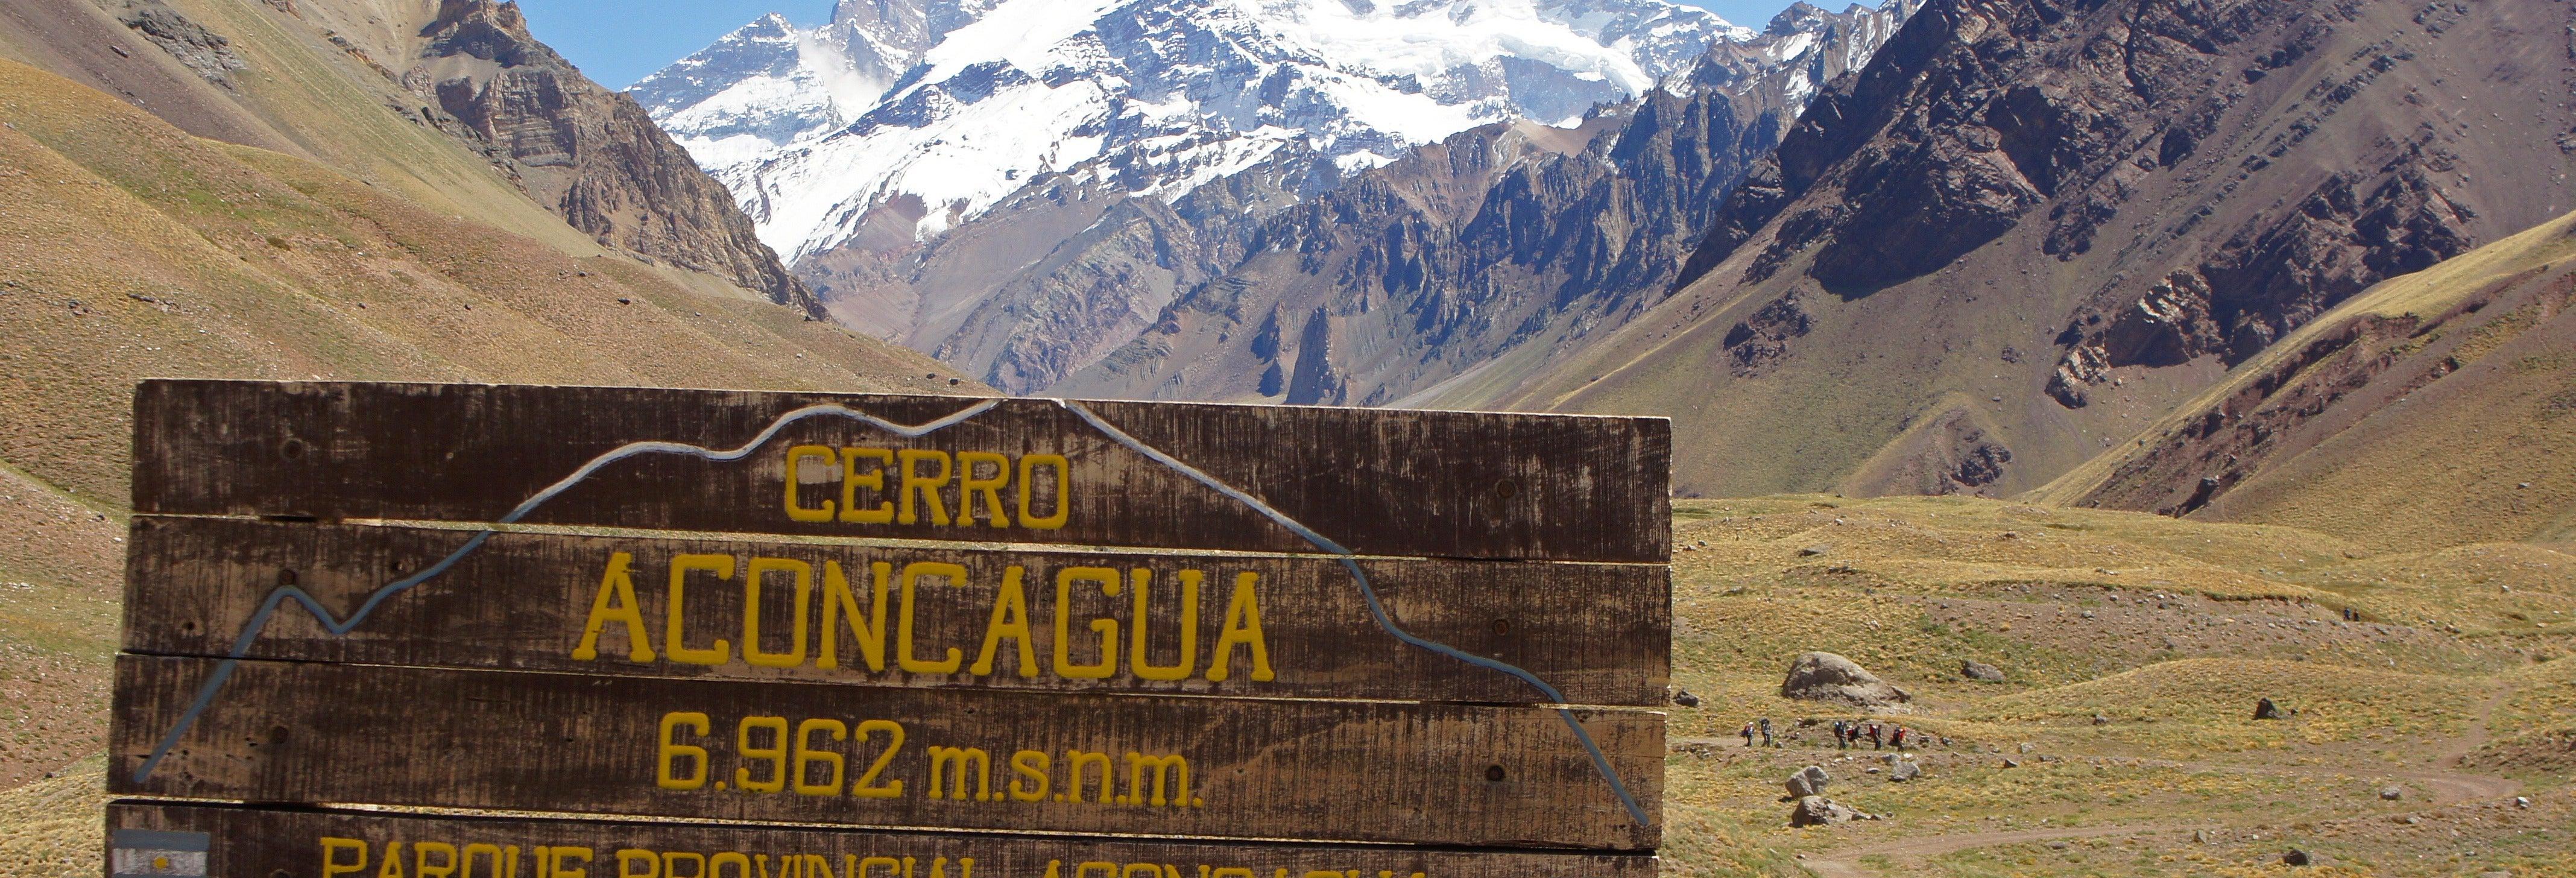 Escursione al Parco Aconcagua